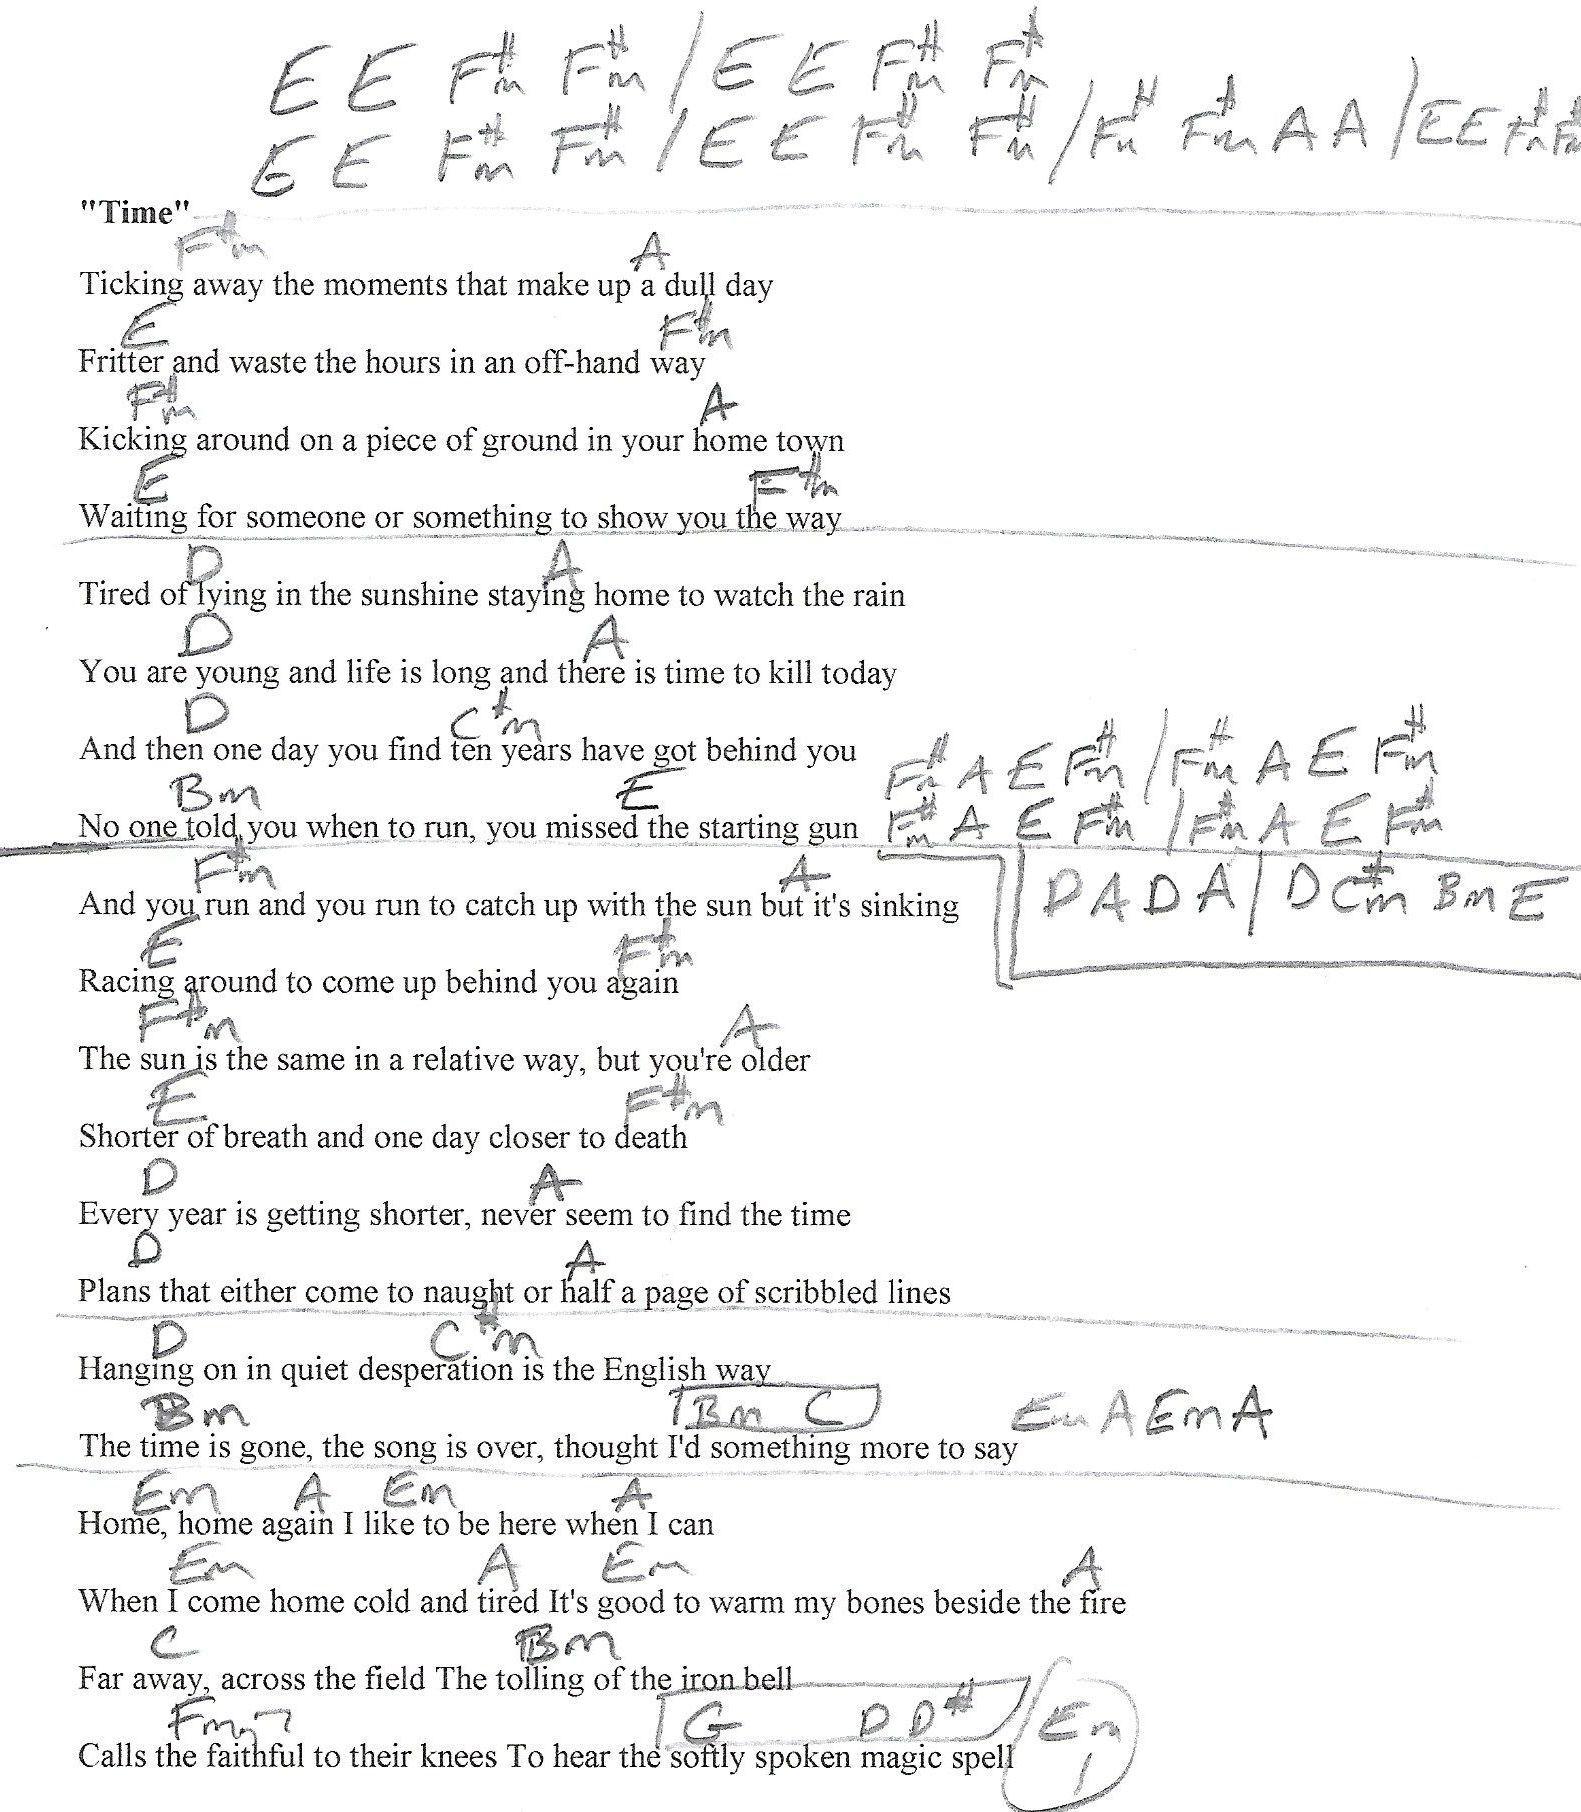 Time Pink Floyd Guitar Lesson Chord Chart With Lyrics Guitar